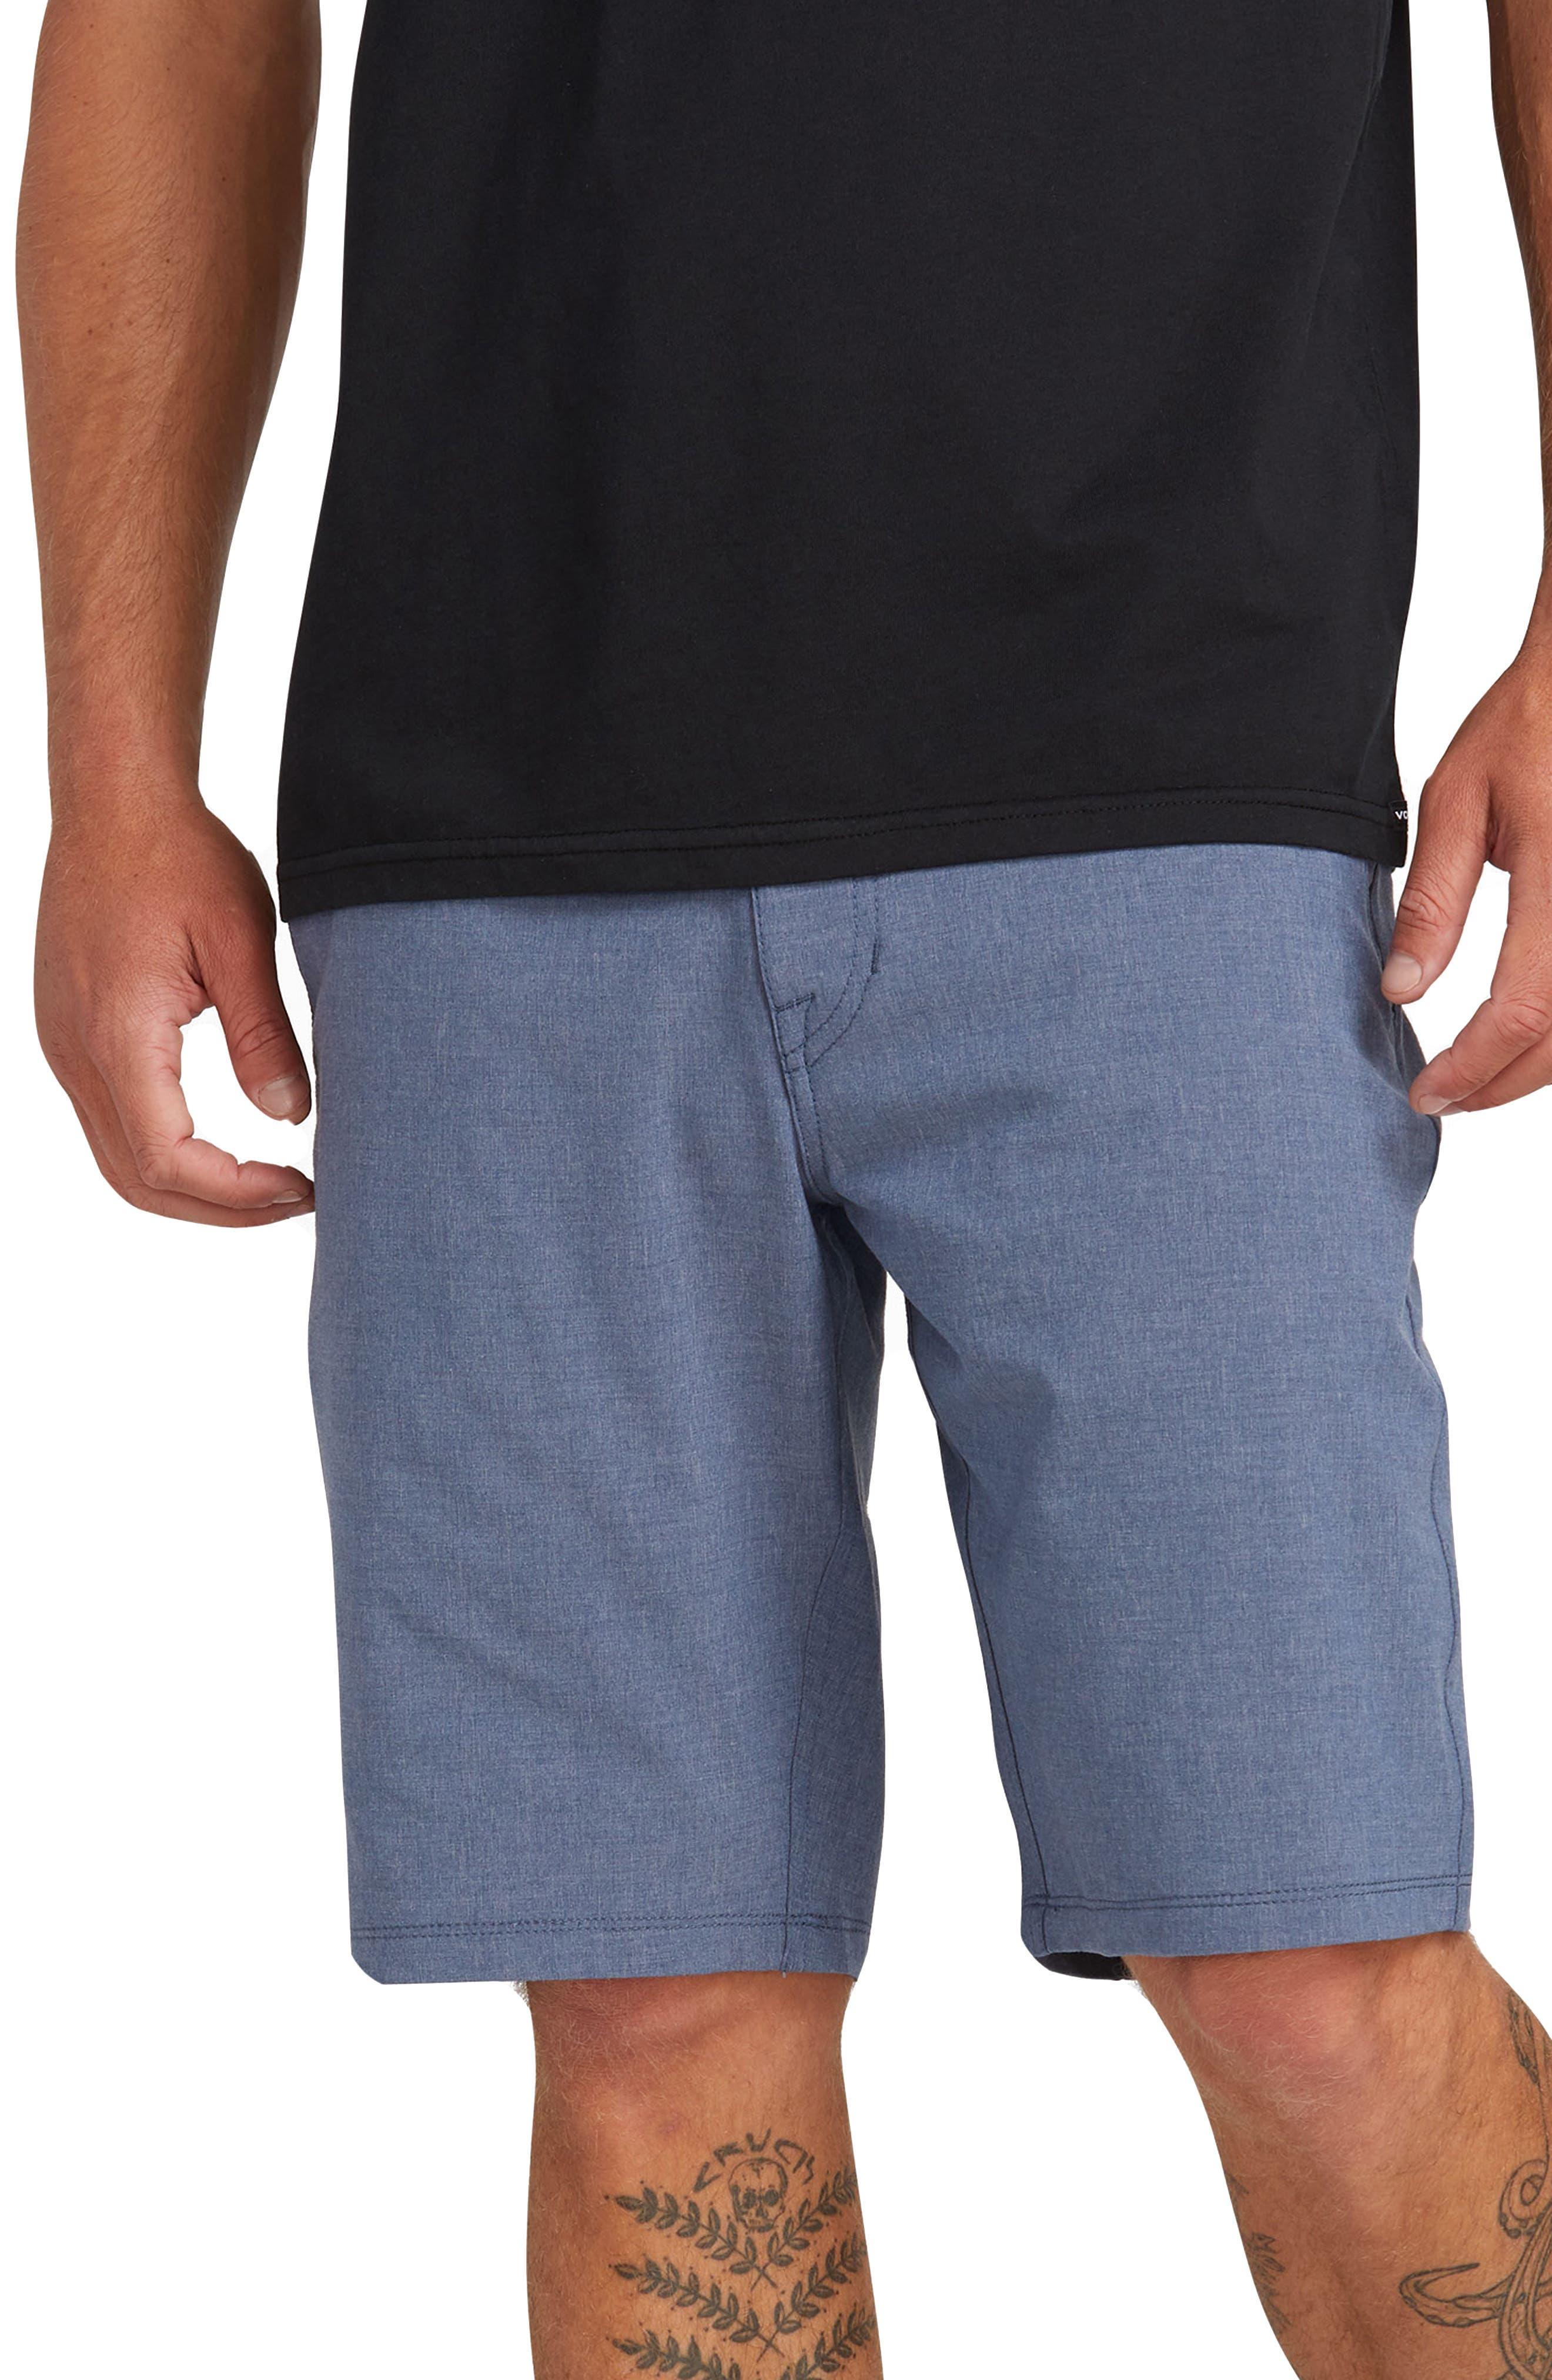 VOLCOM, Hybrid Shorts, Main thumbnail 1, color, DEEP BLUE